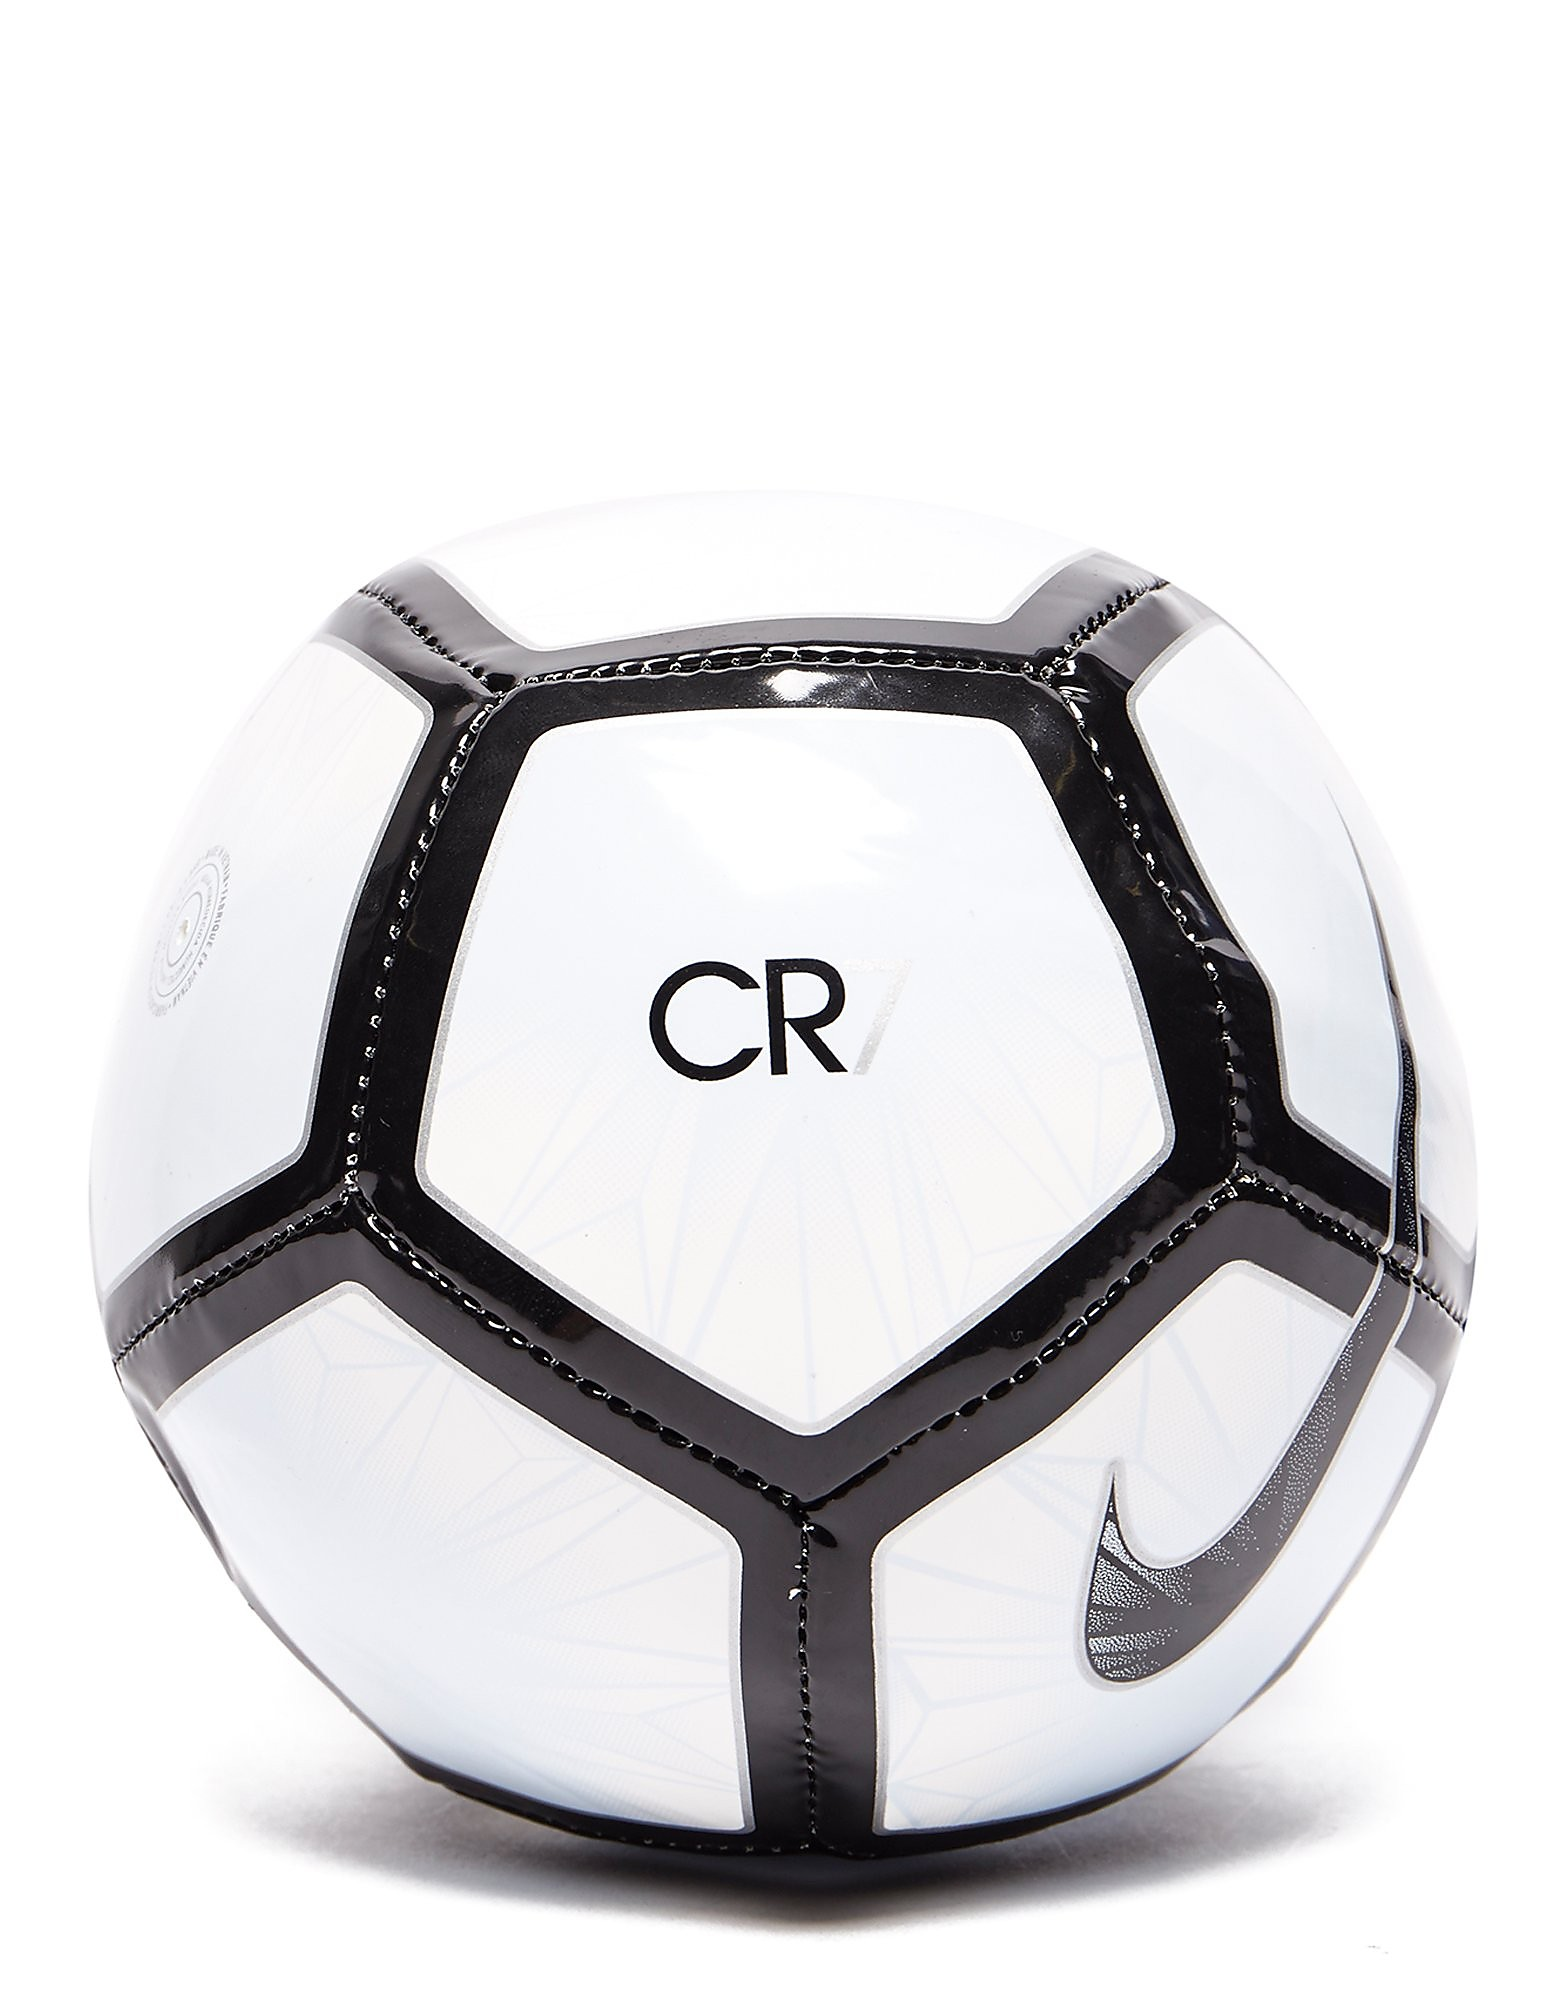 Nike Mini CR7 Football